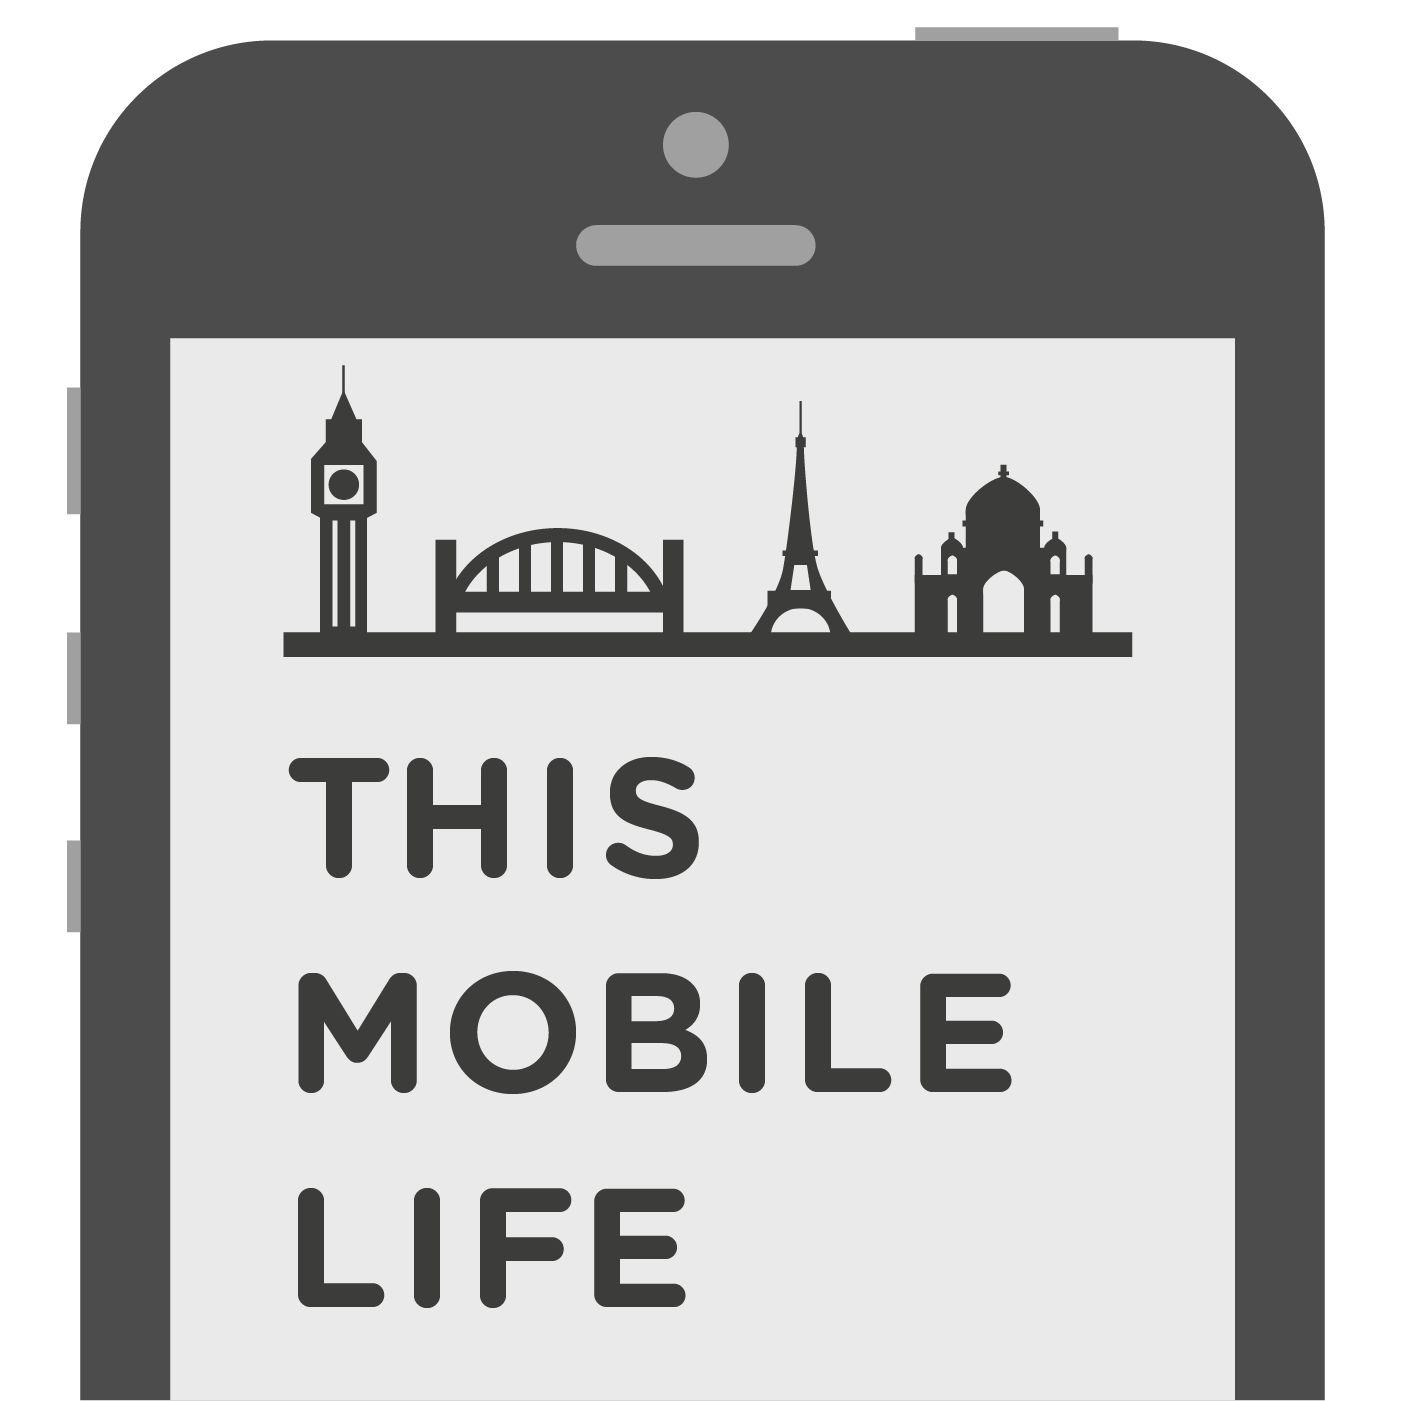 This Mobile Life logo